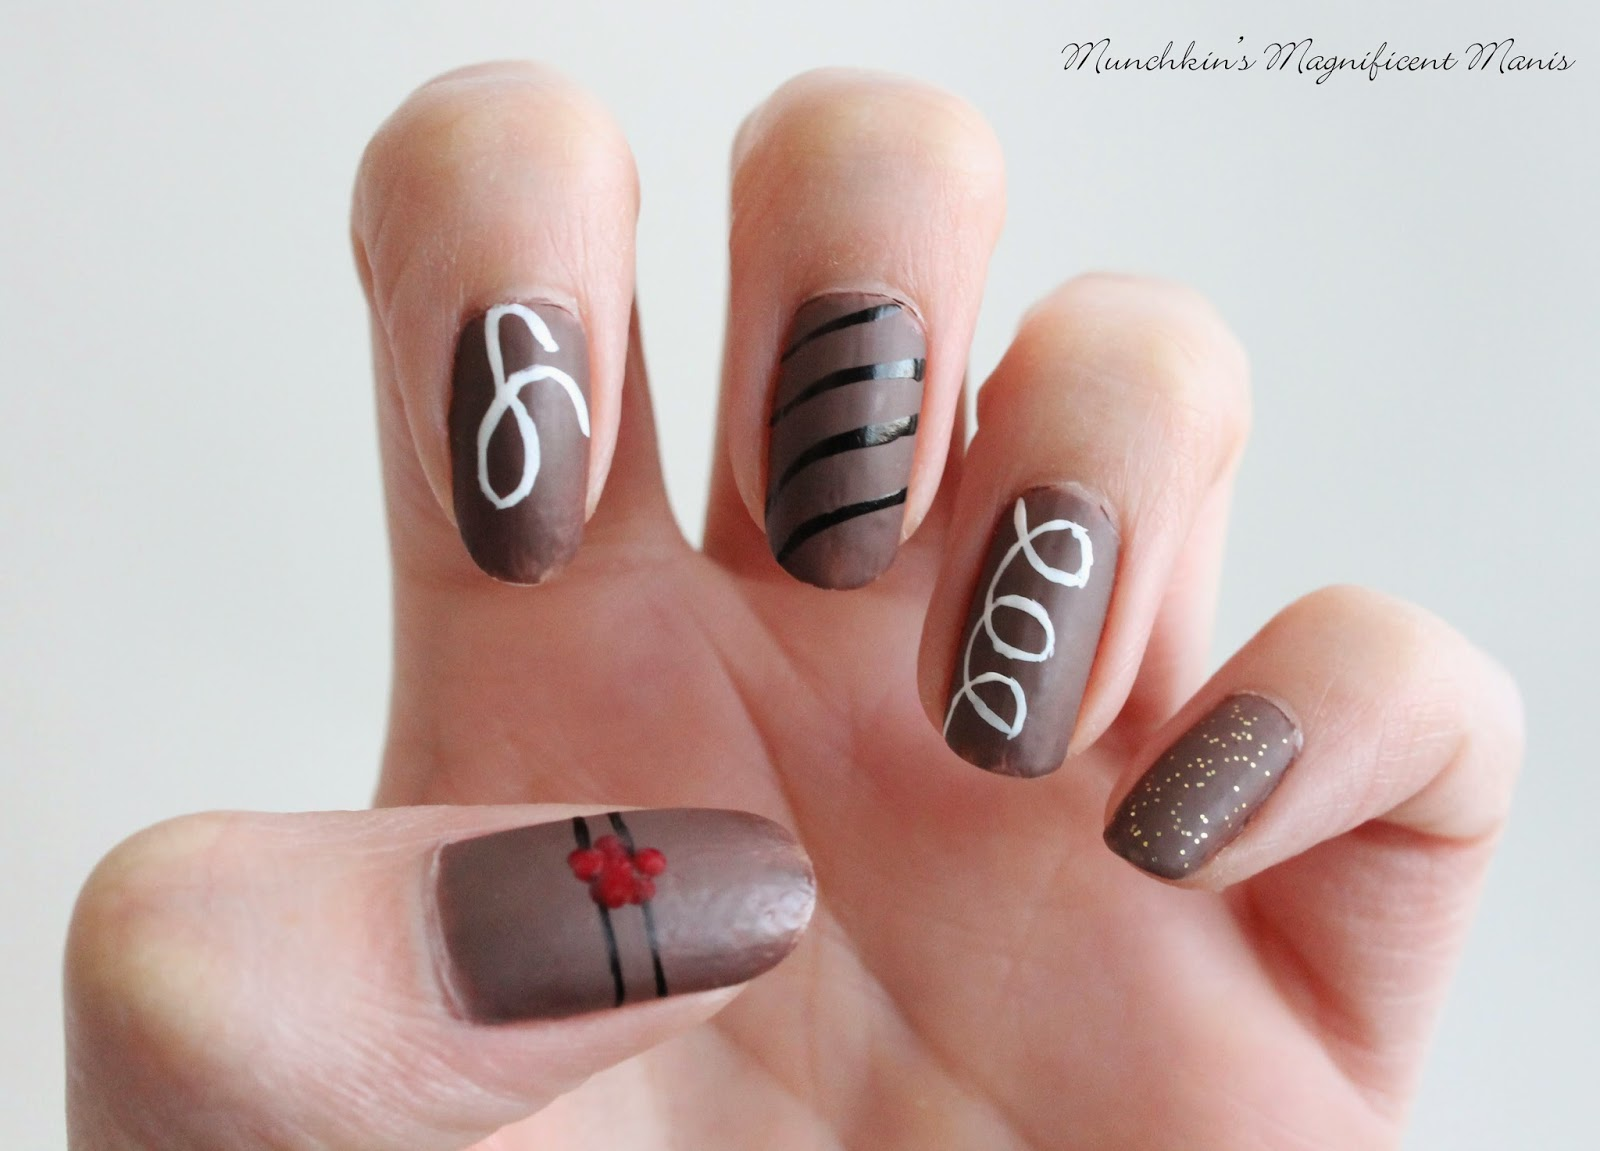 Chocolate nail design